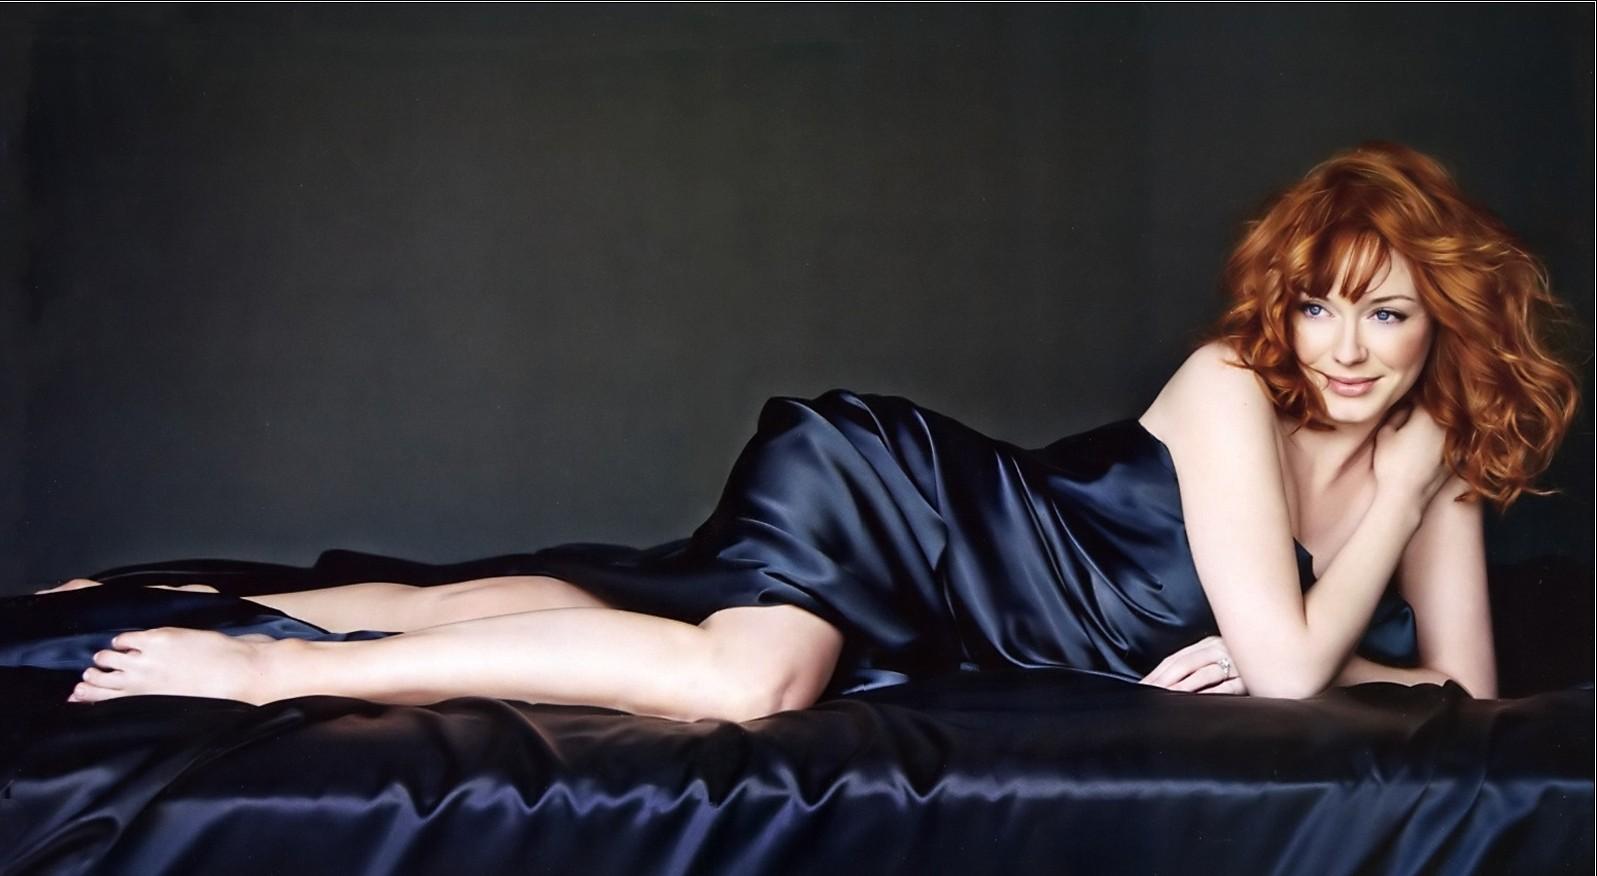 Christina Hendricks Beautiful Fresh Hot Hd Wallpaper 2013